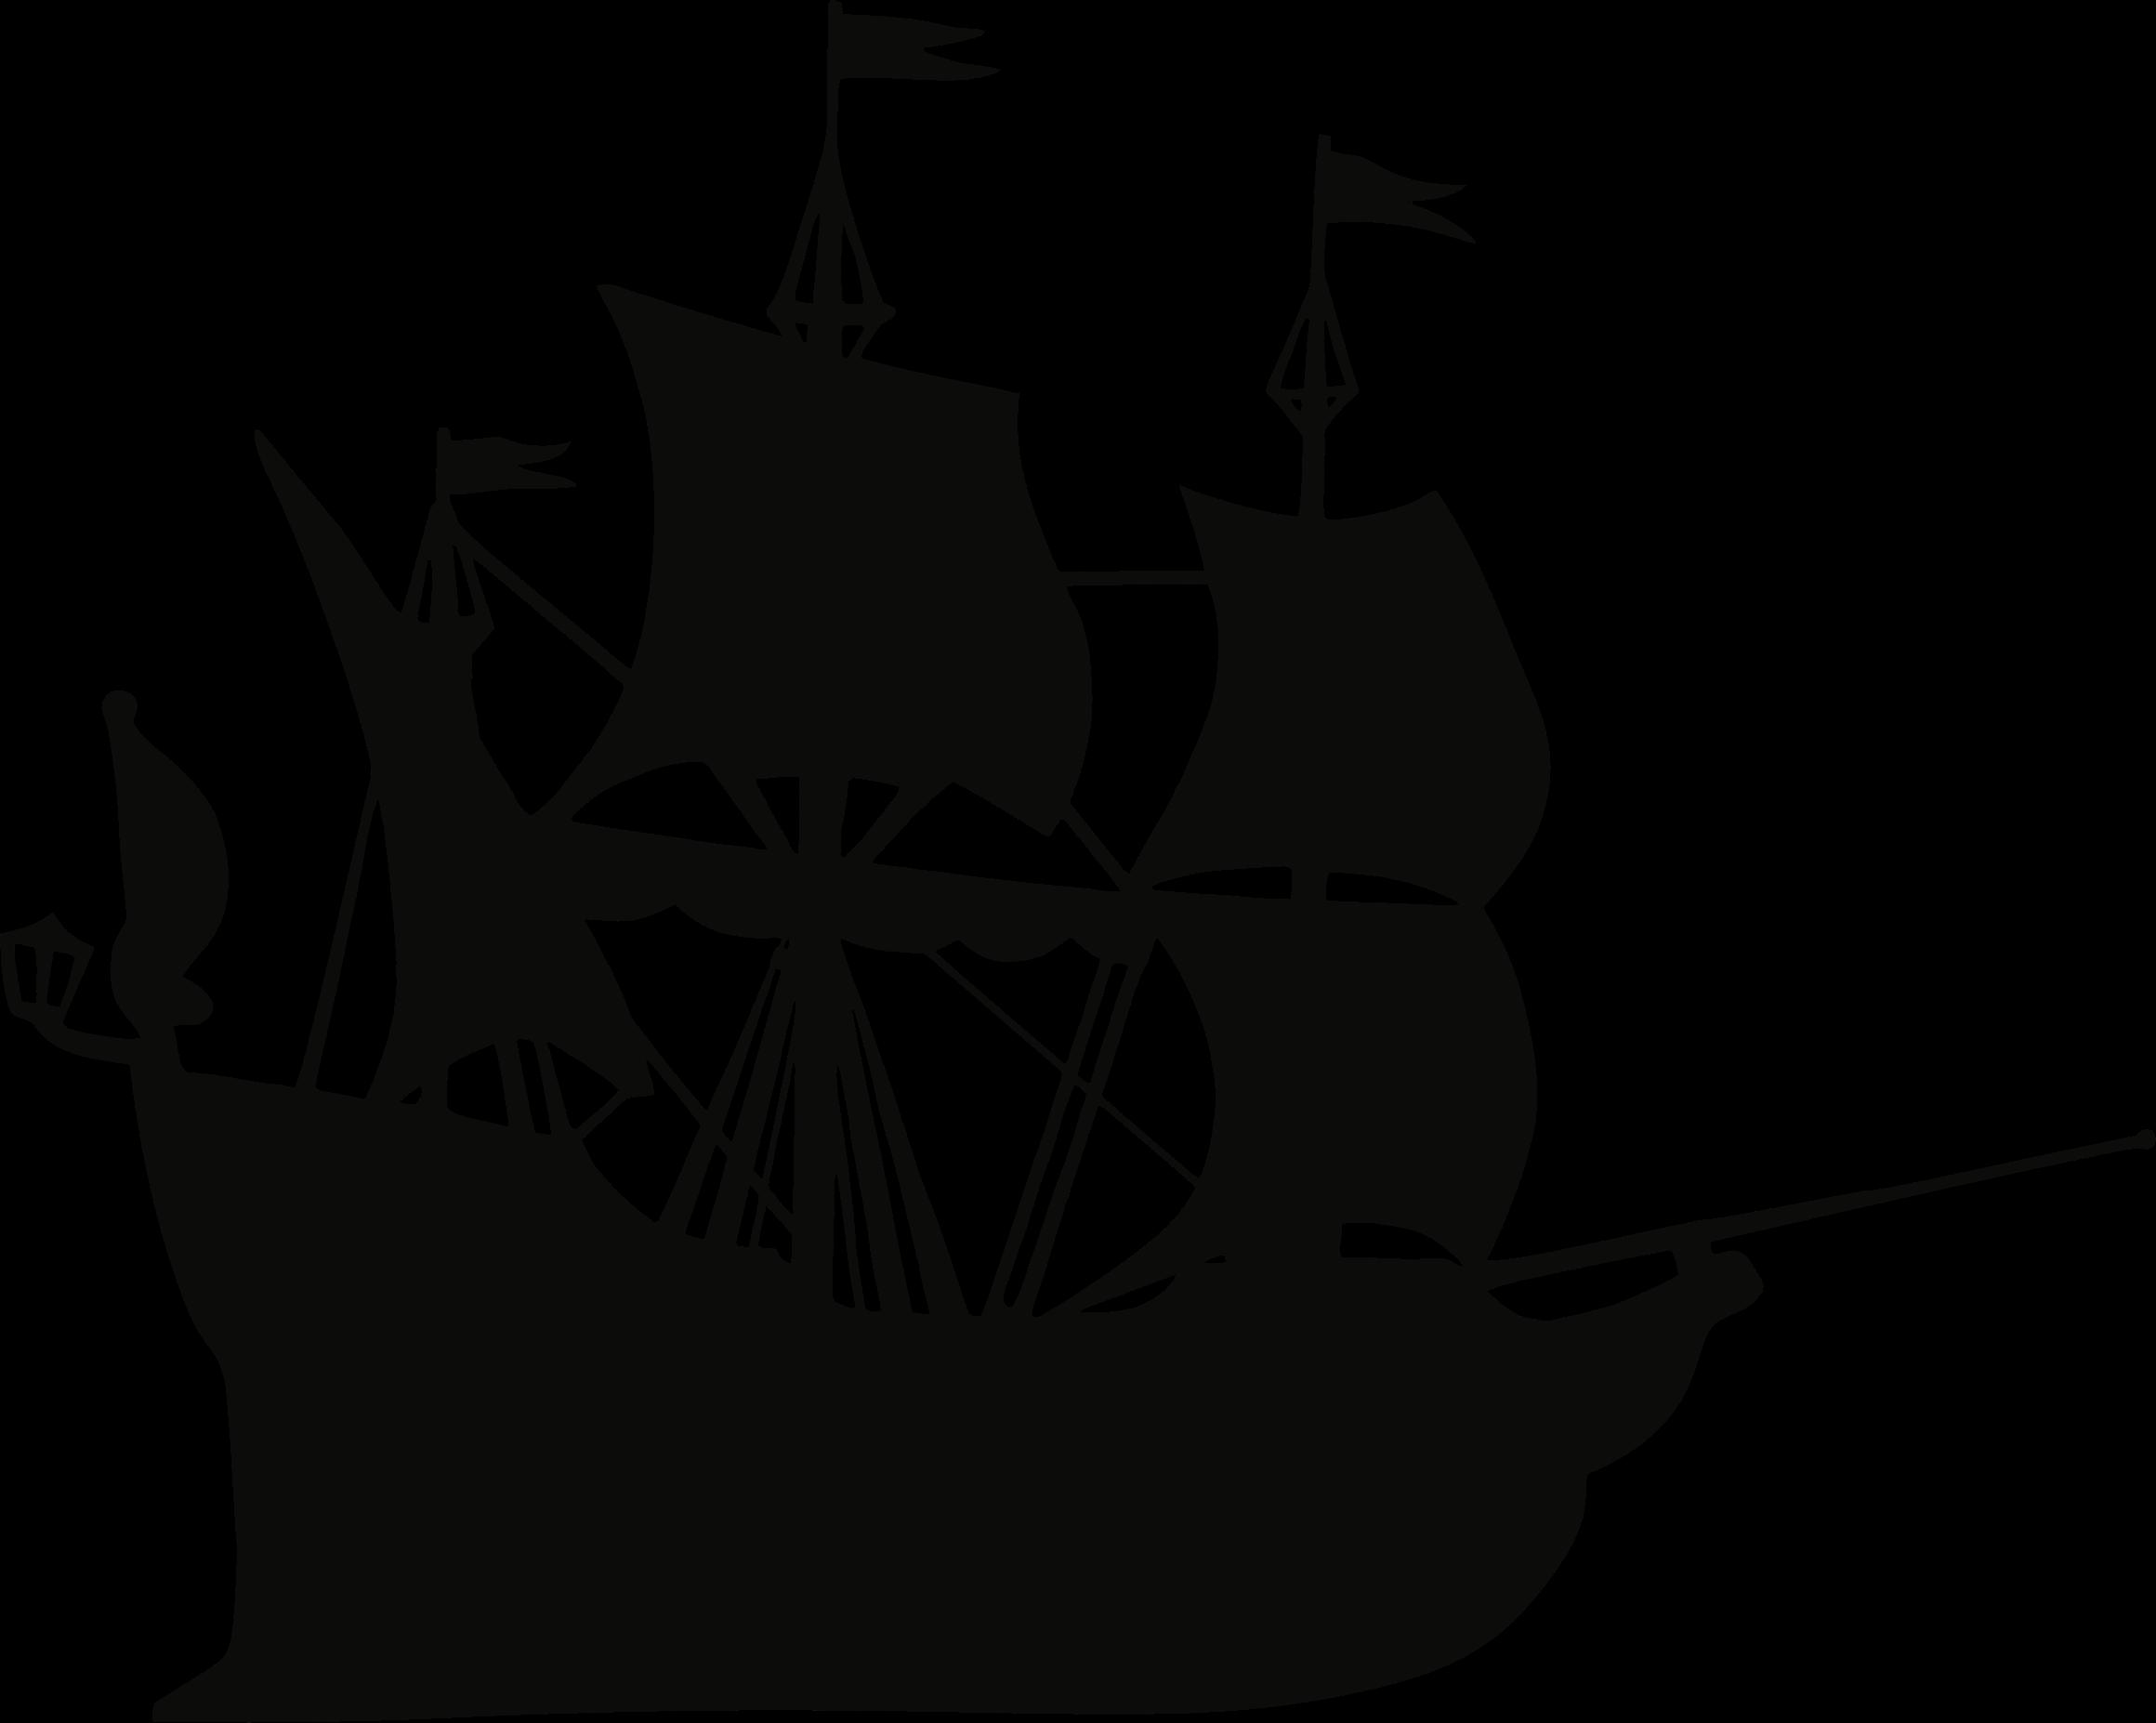 Silhouette ship